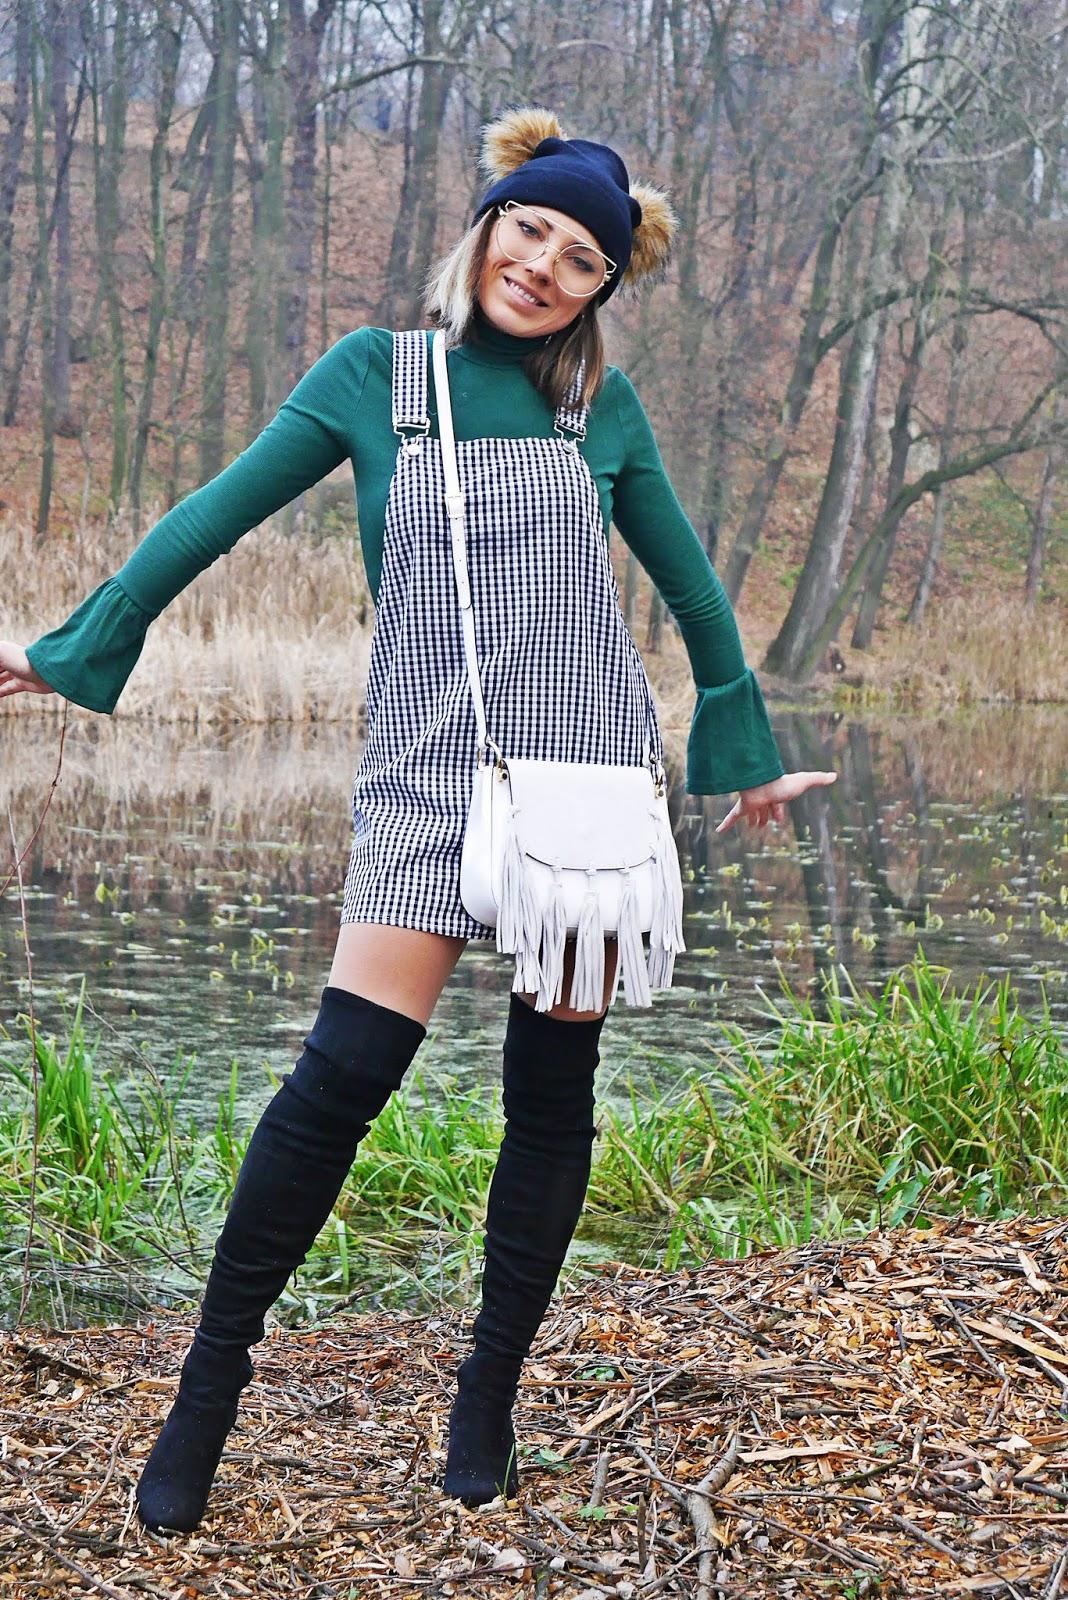 Pułąwy blog modowy blogerka modowa karyn